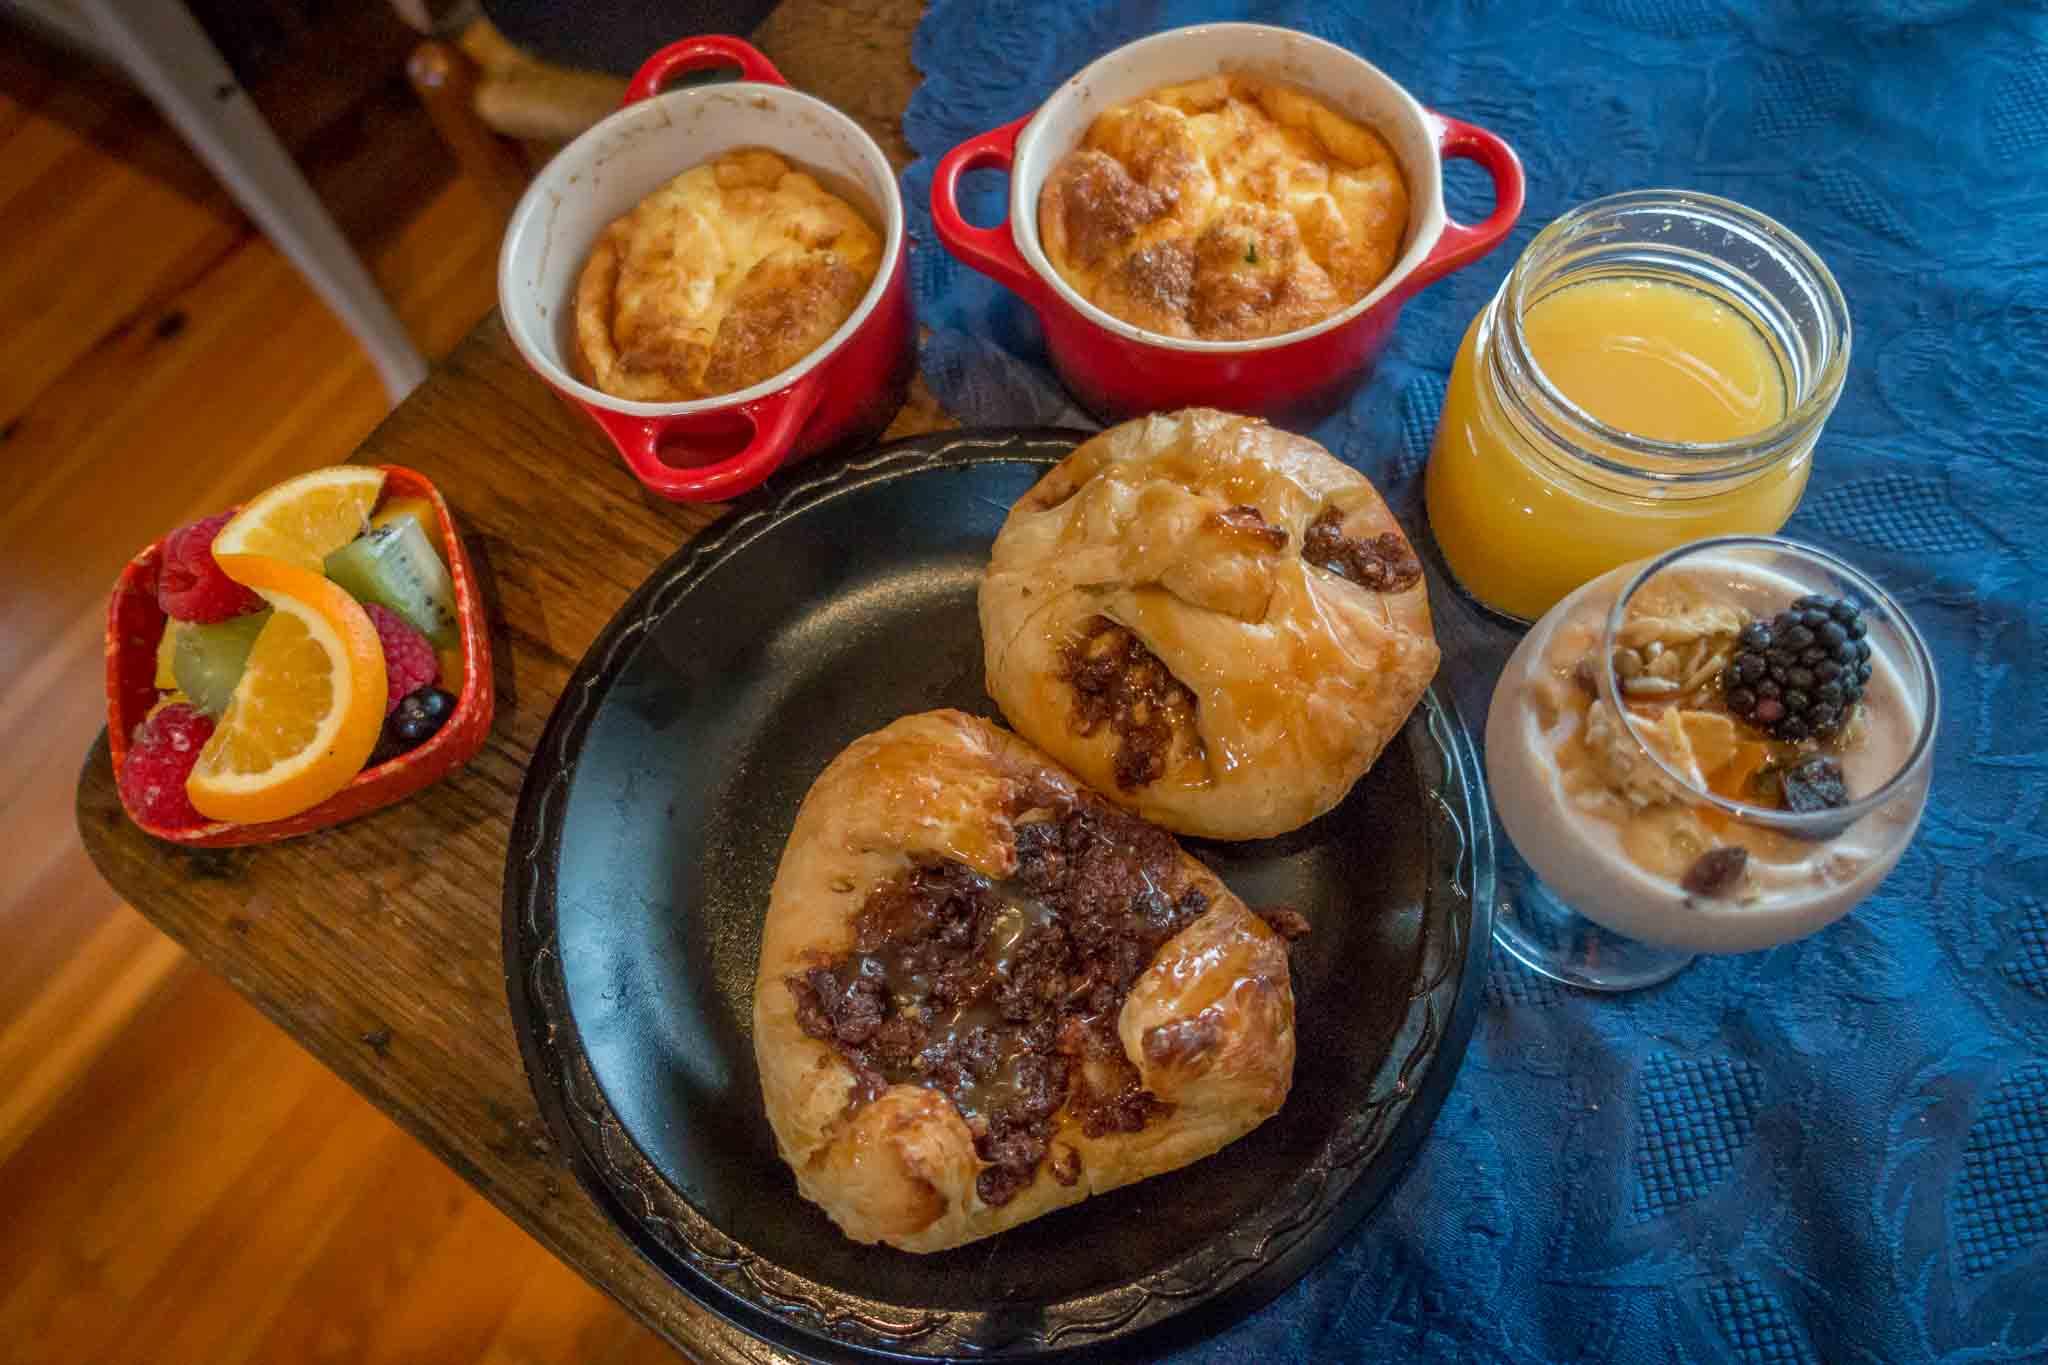 Pastries, souffles, yogurt, fruit, and orange juice on a table